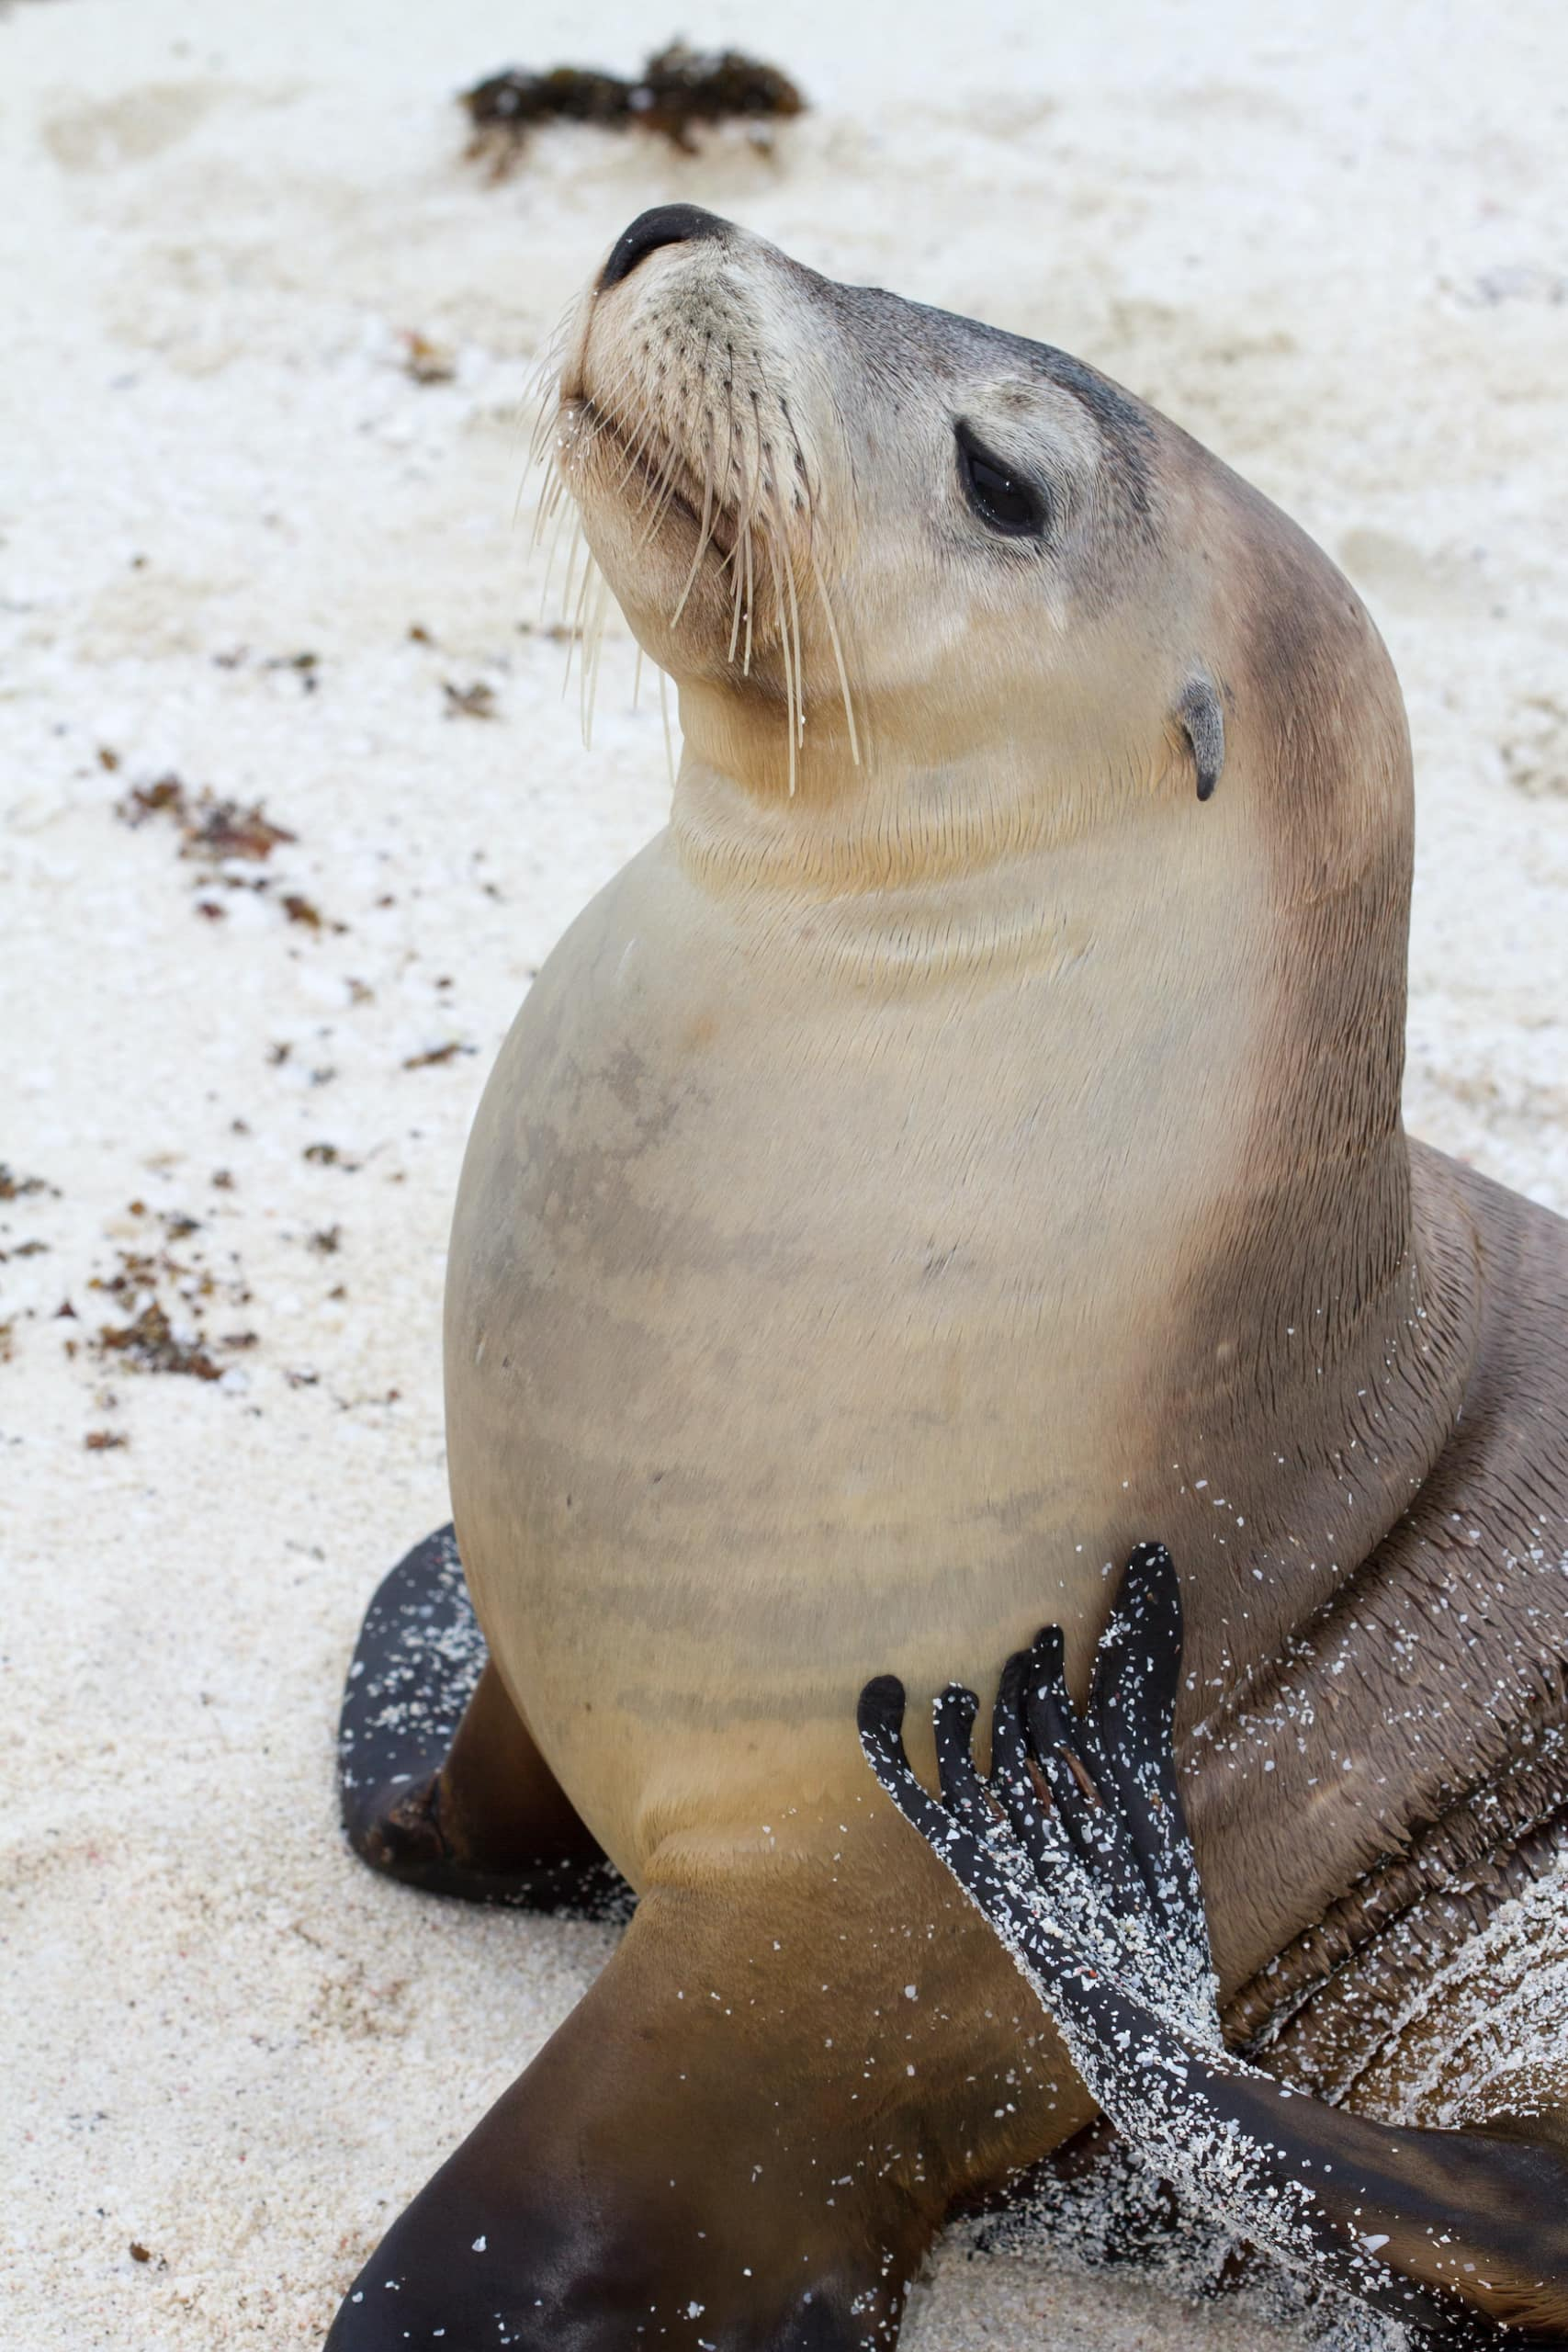 Robbe am Strand der Abrolhos Islands